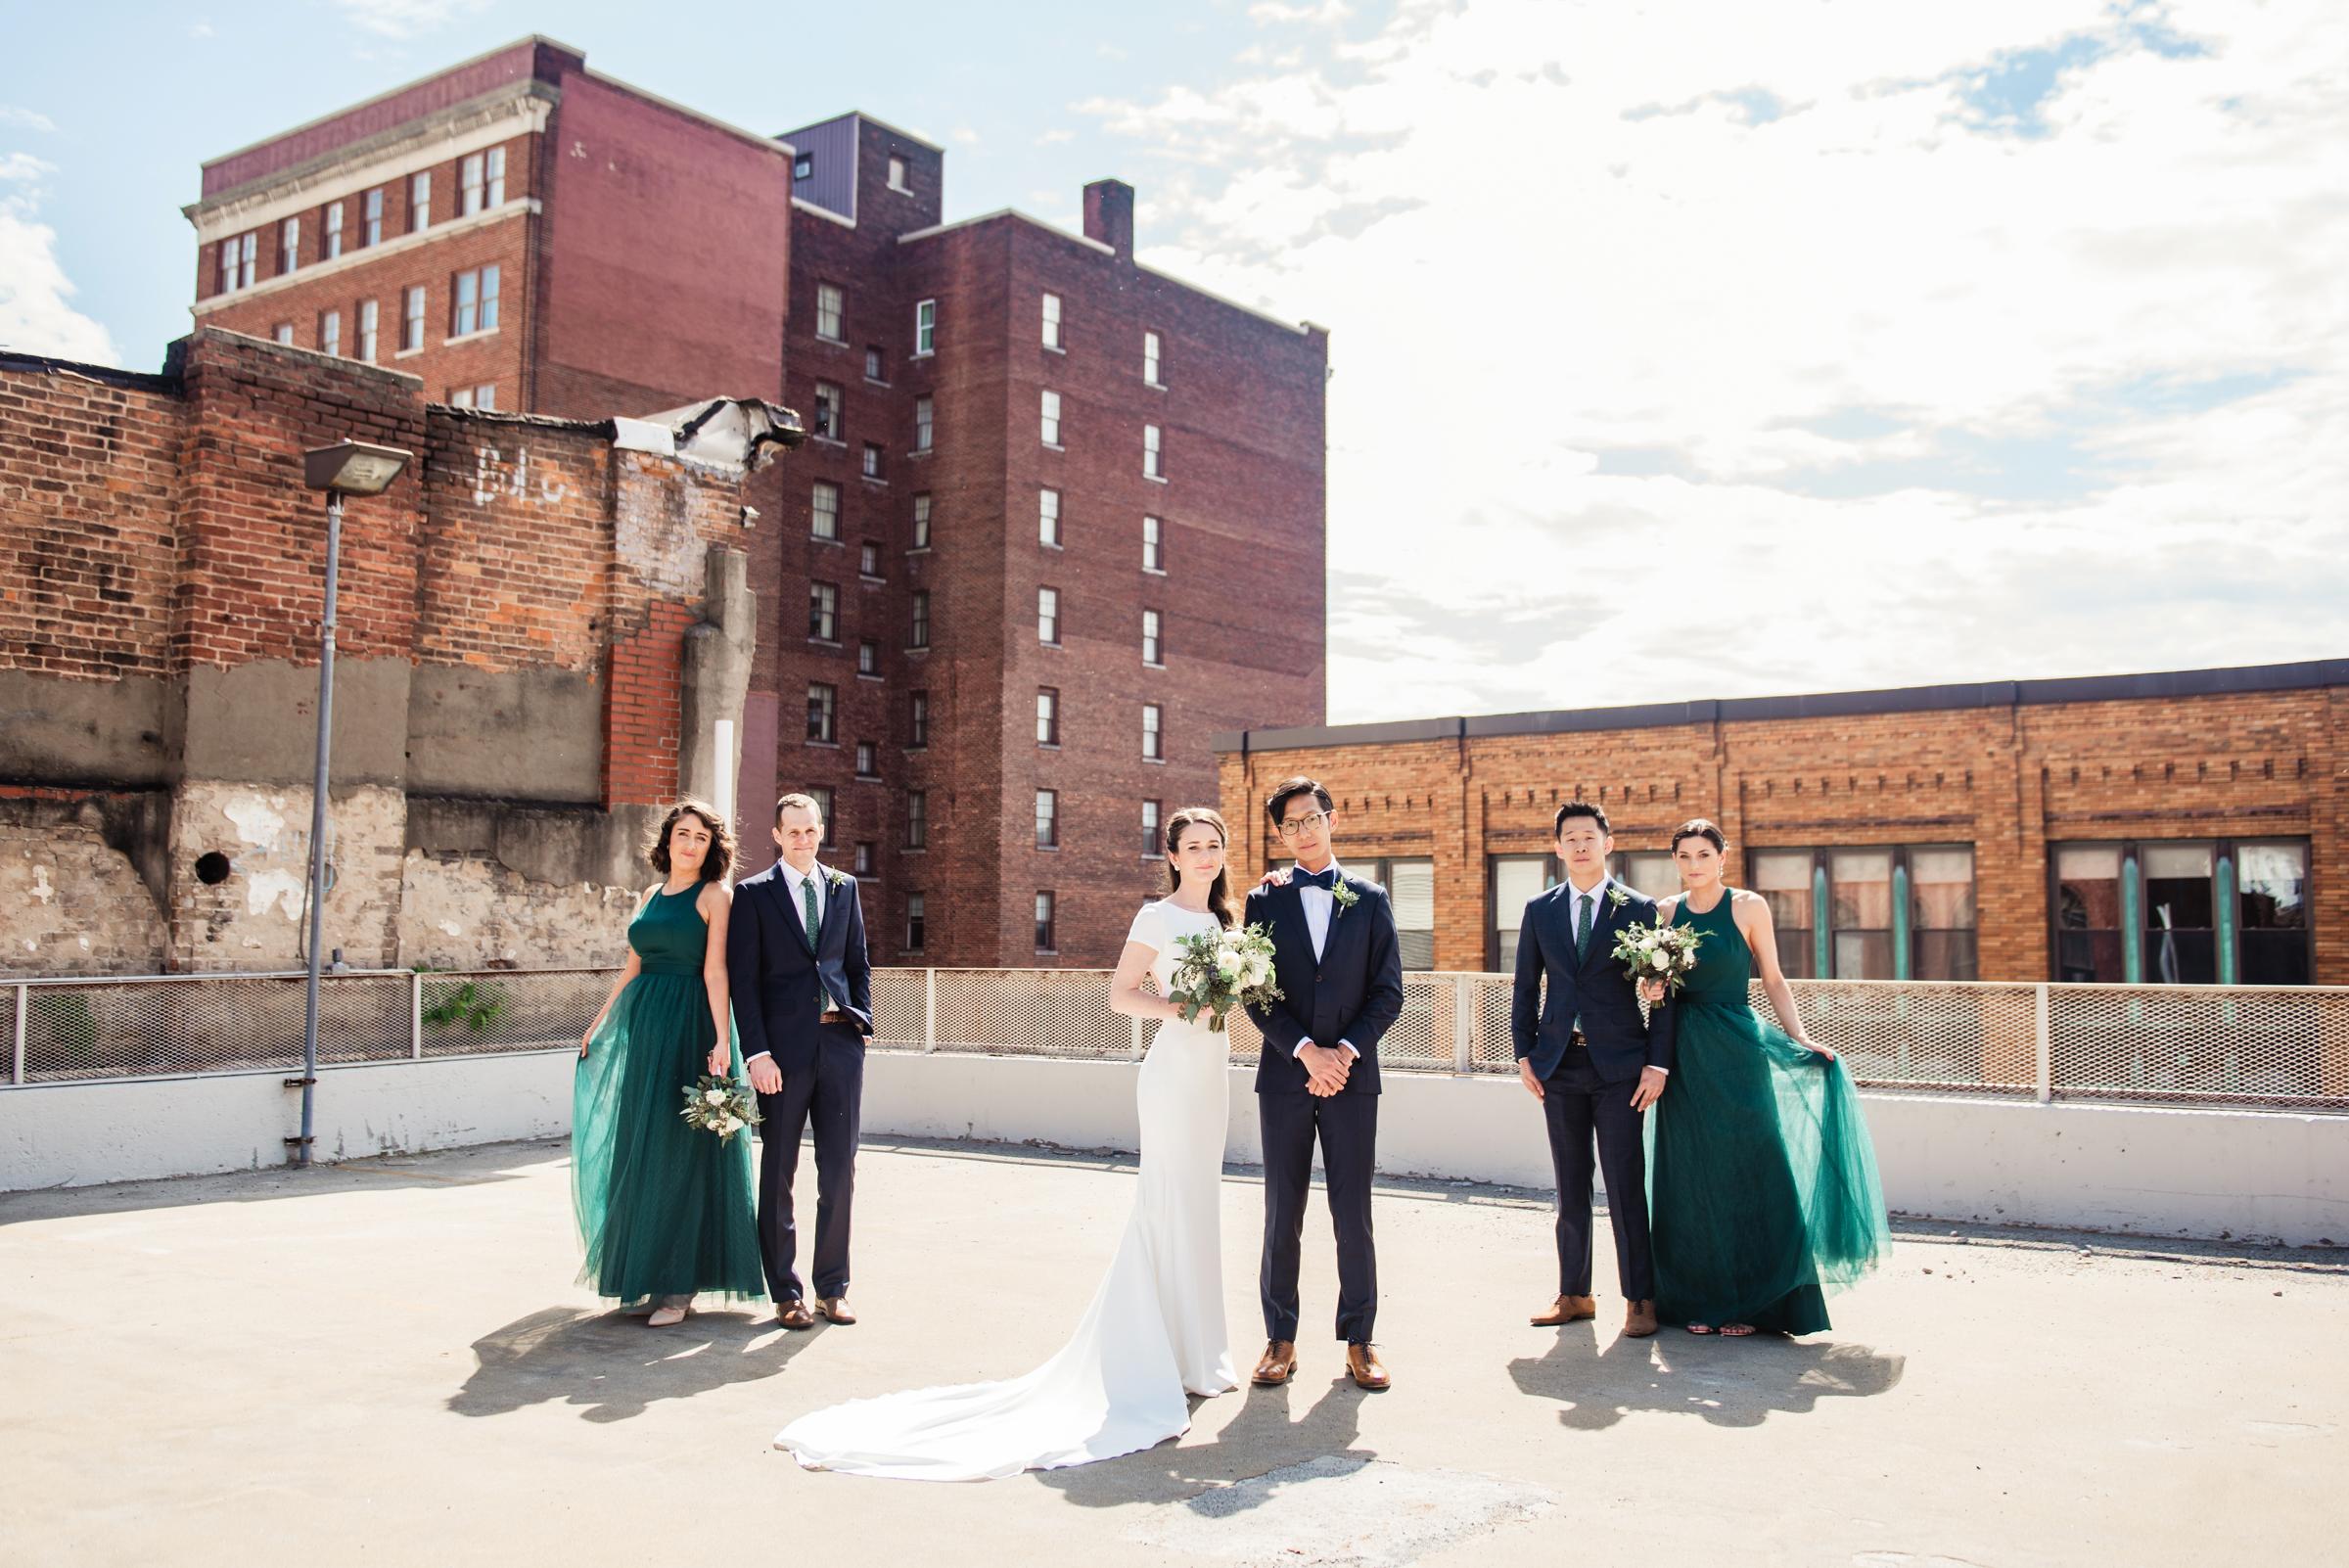 SKY_Armory_Syracuse_Wedding_JILL_STUDIO_Rochester_NY_Photographer_DSC_5549.jpg